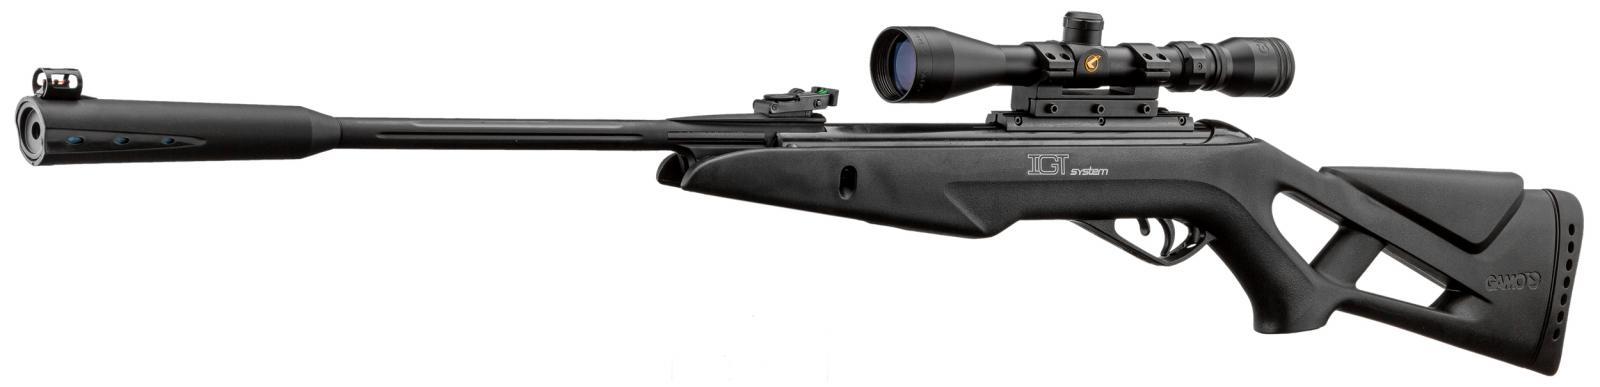 Carabine GAMO WHISPER IGT + Lunette 3-9x40wr